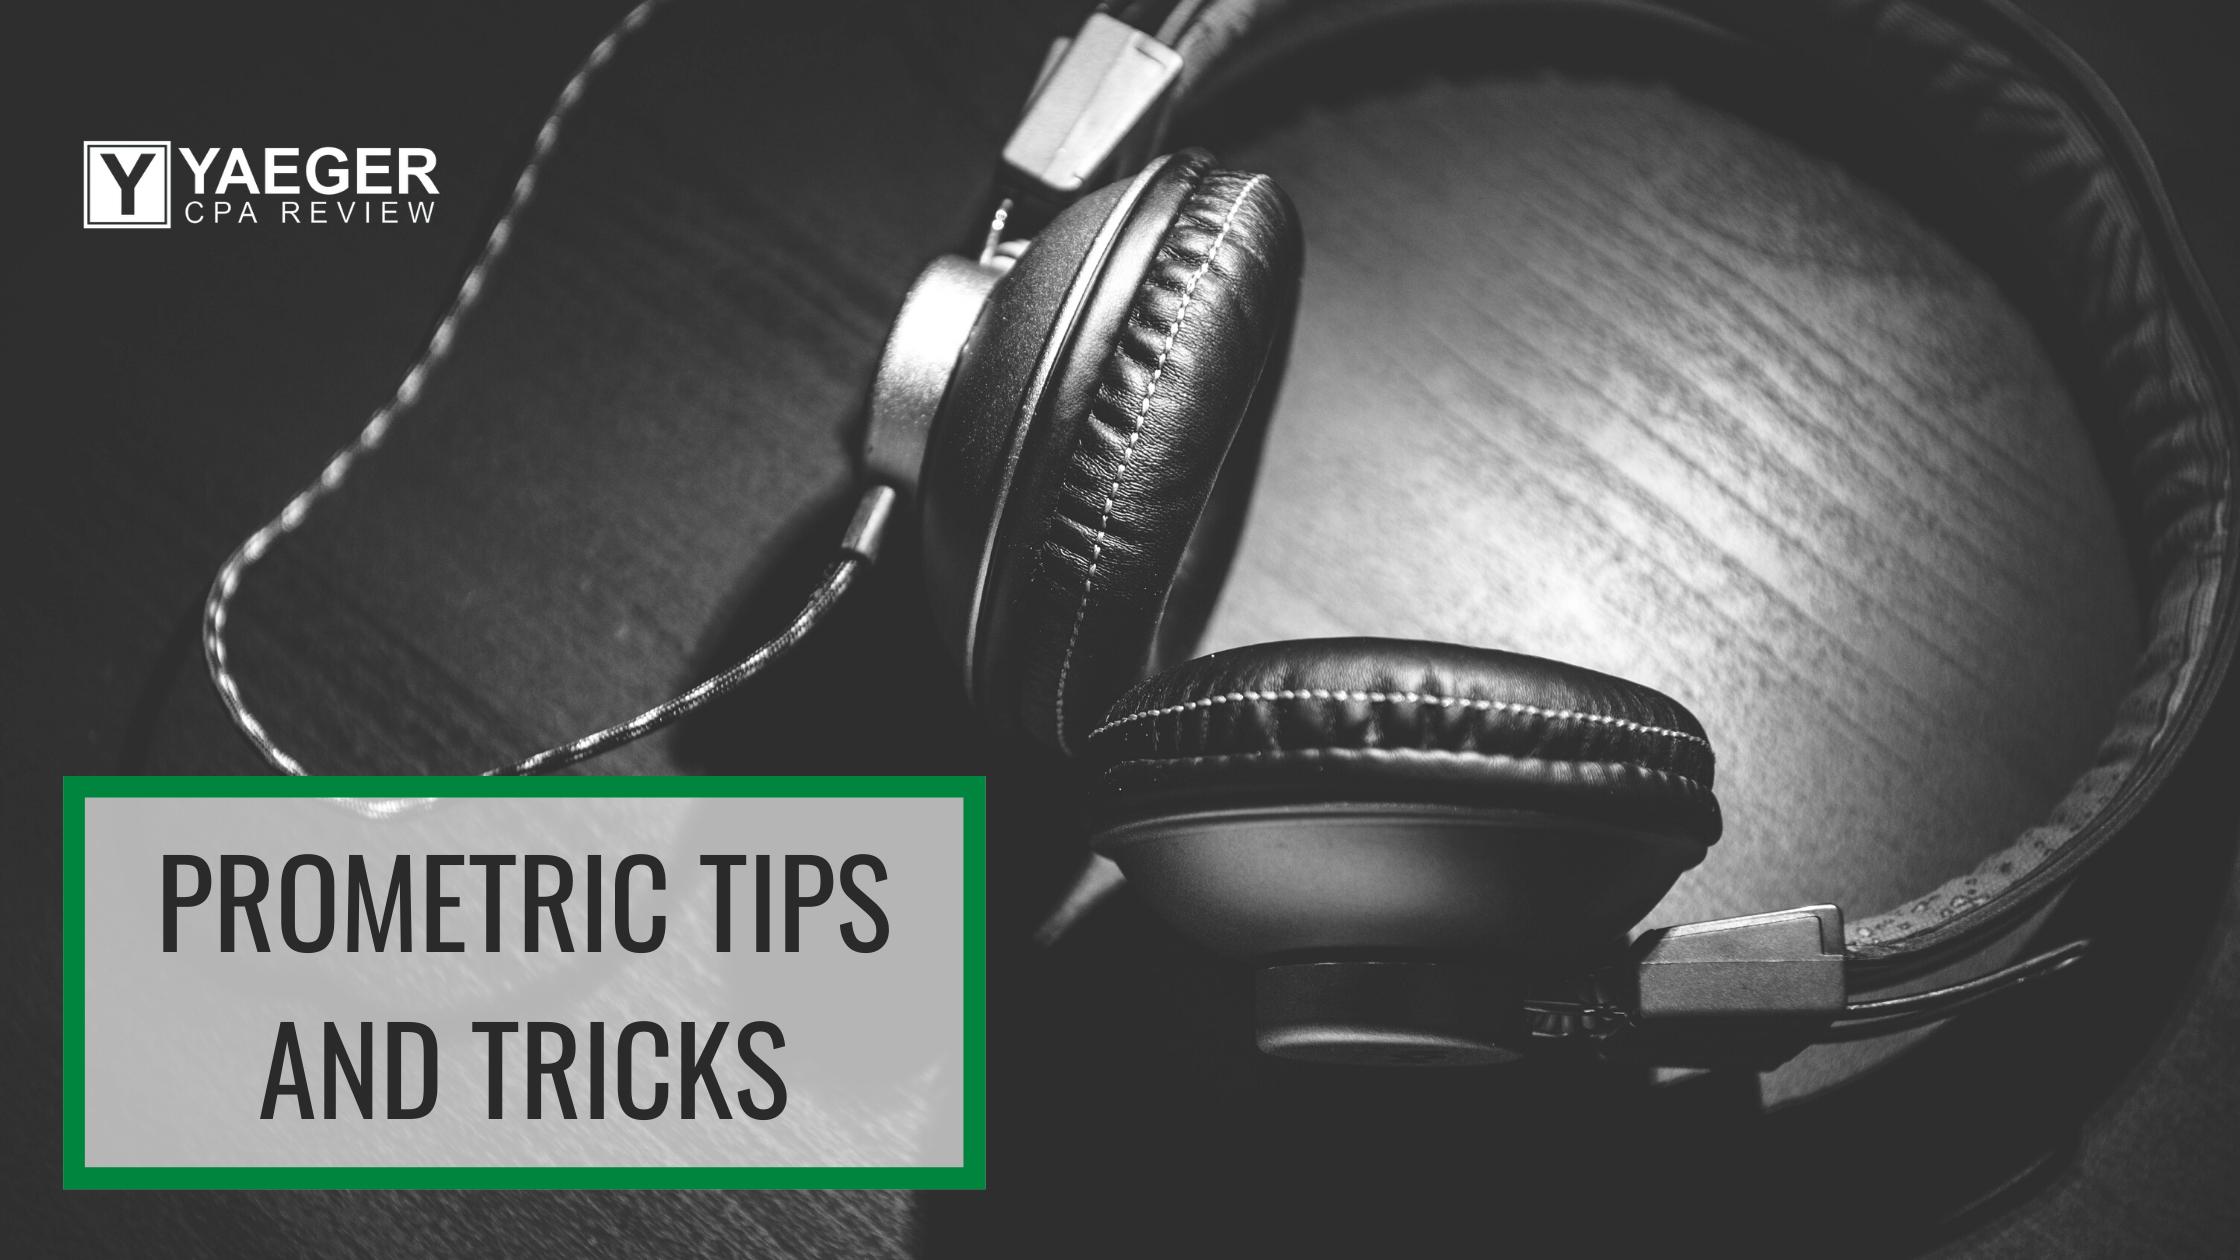 Prometric Tips and Tricks